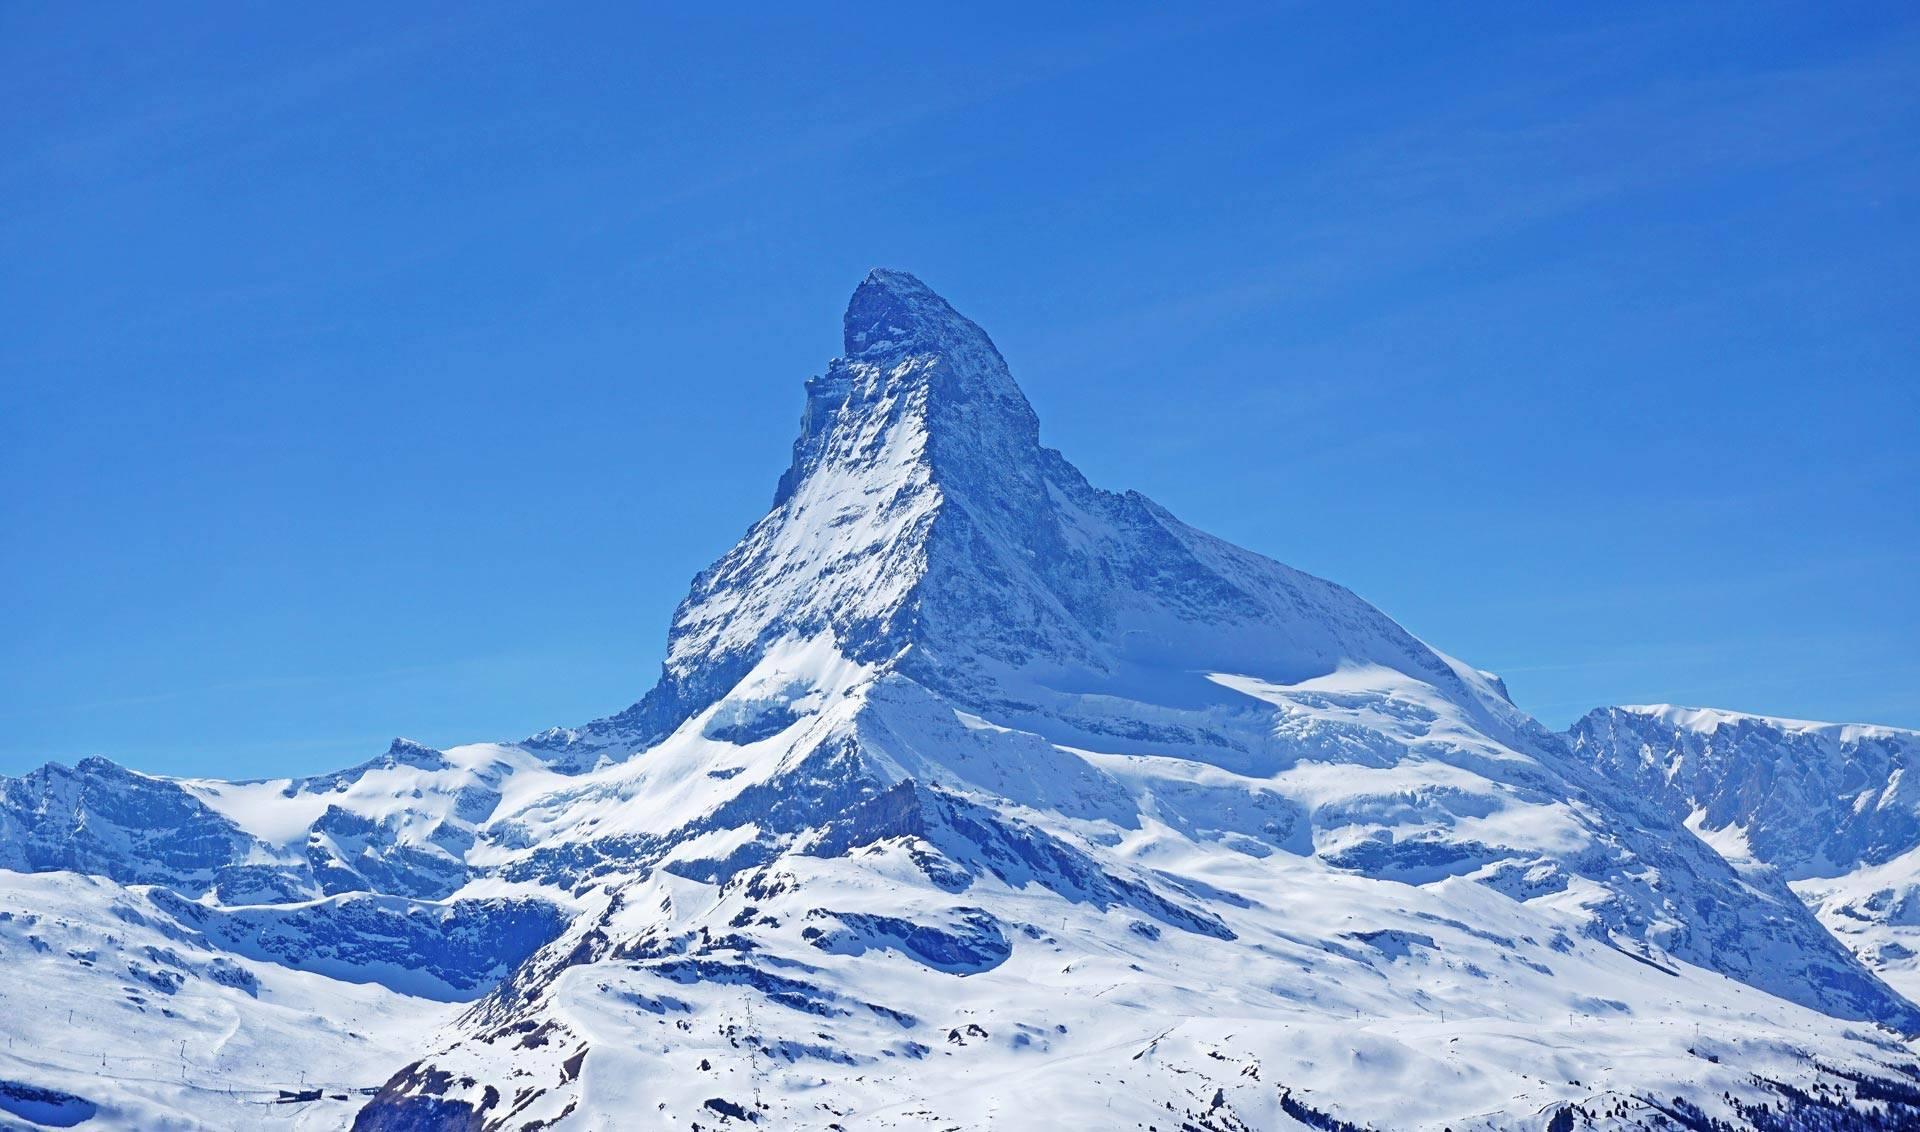 Alpenrose Wealth Management